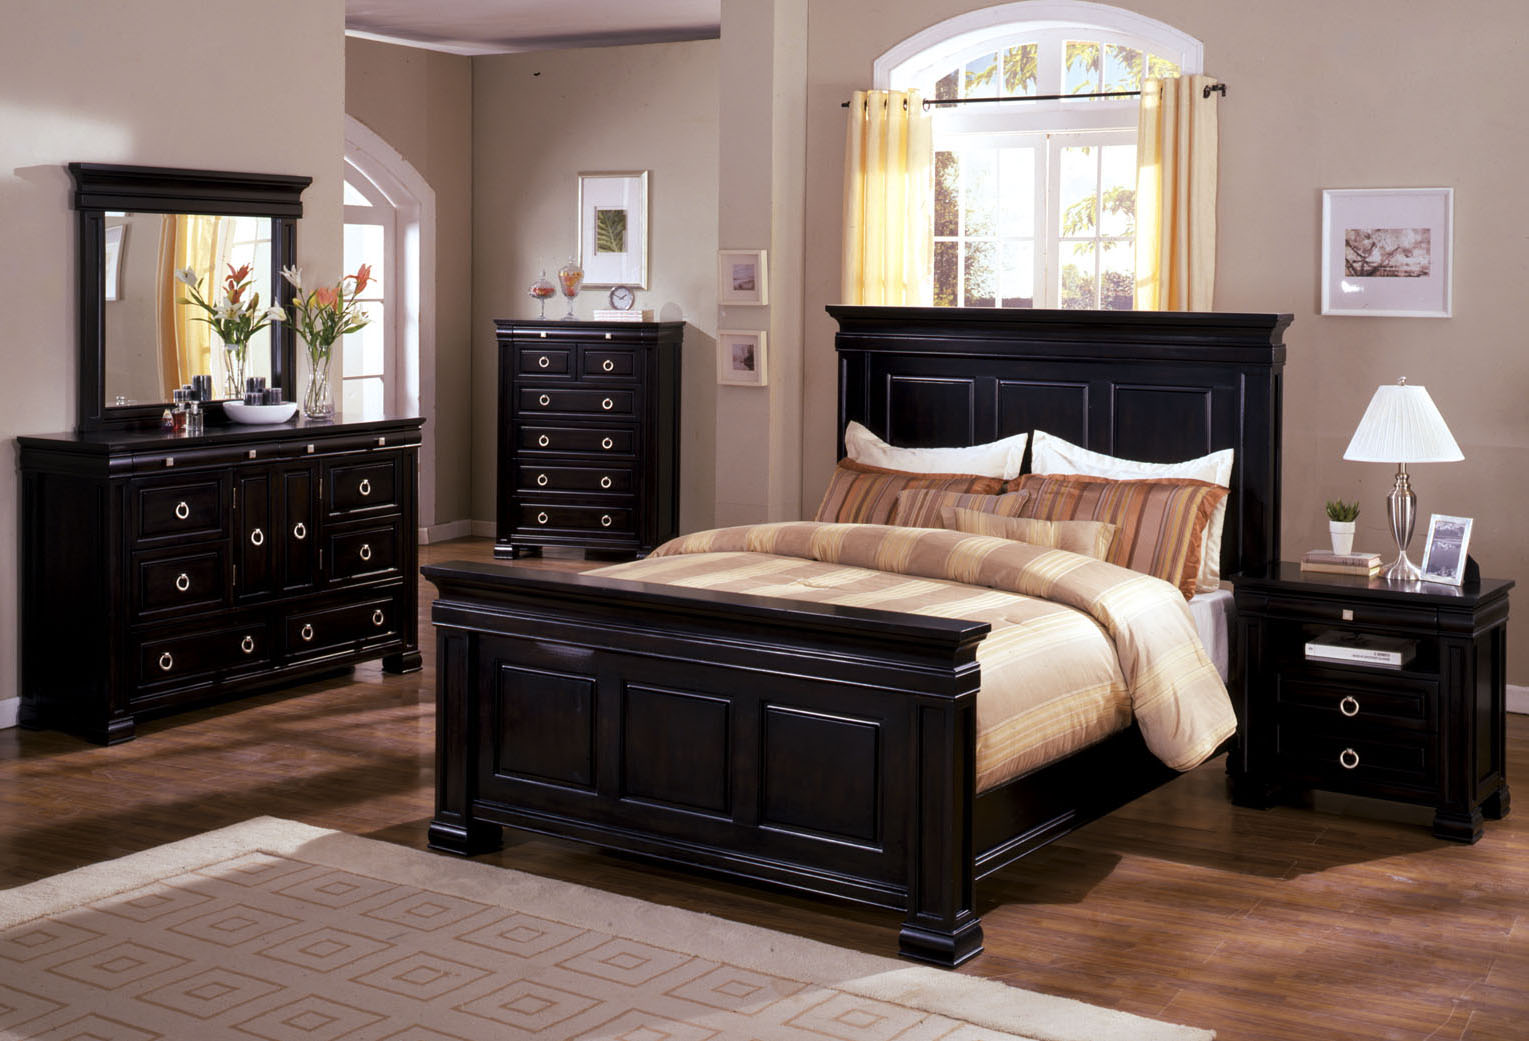 Ikea Bedroom Sets